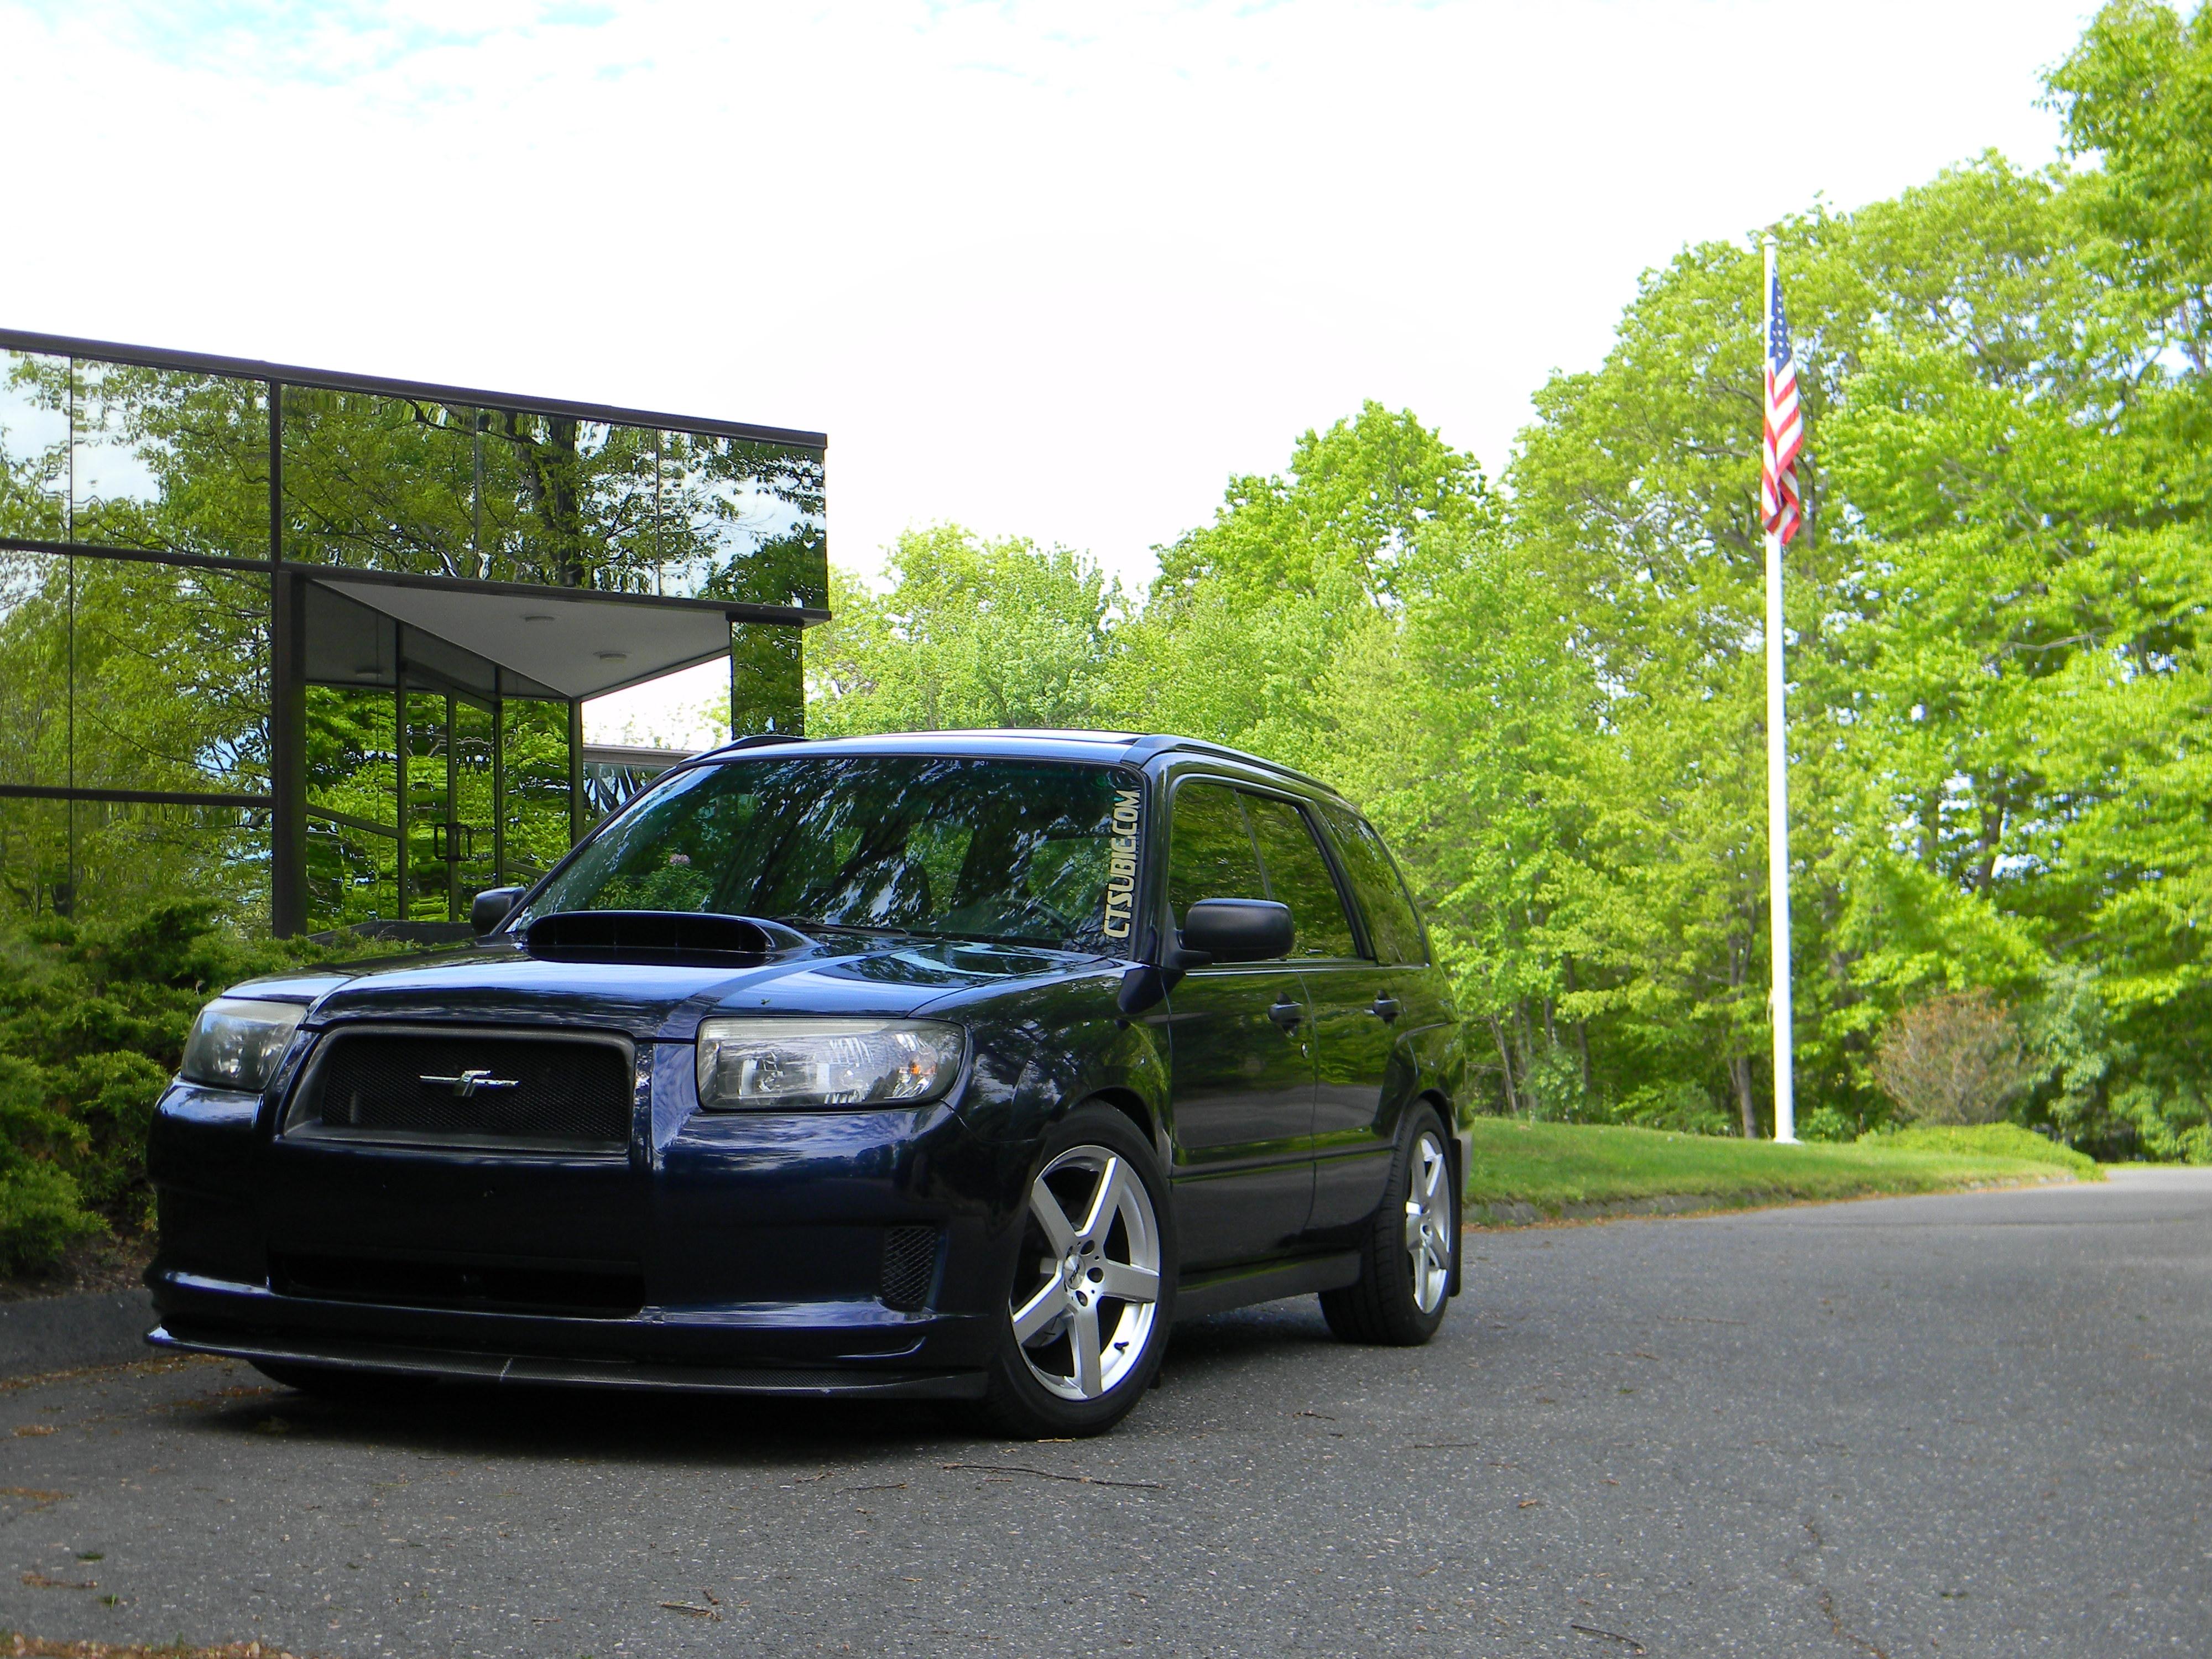 2012 Subaru Forester Throttle Body